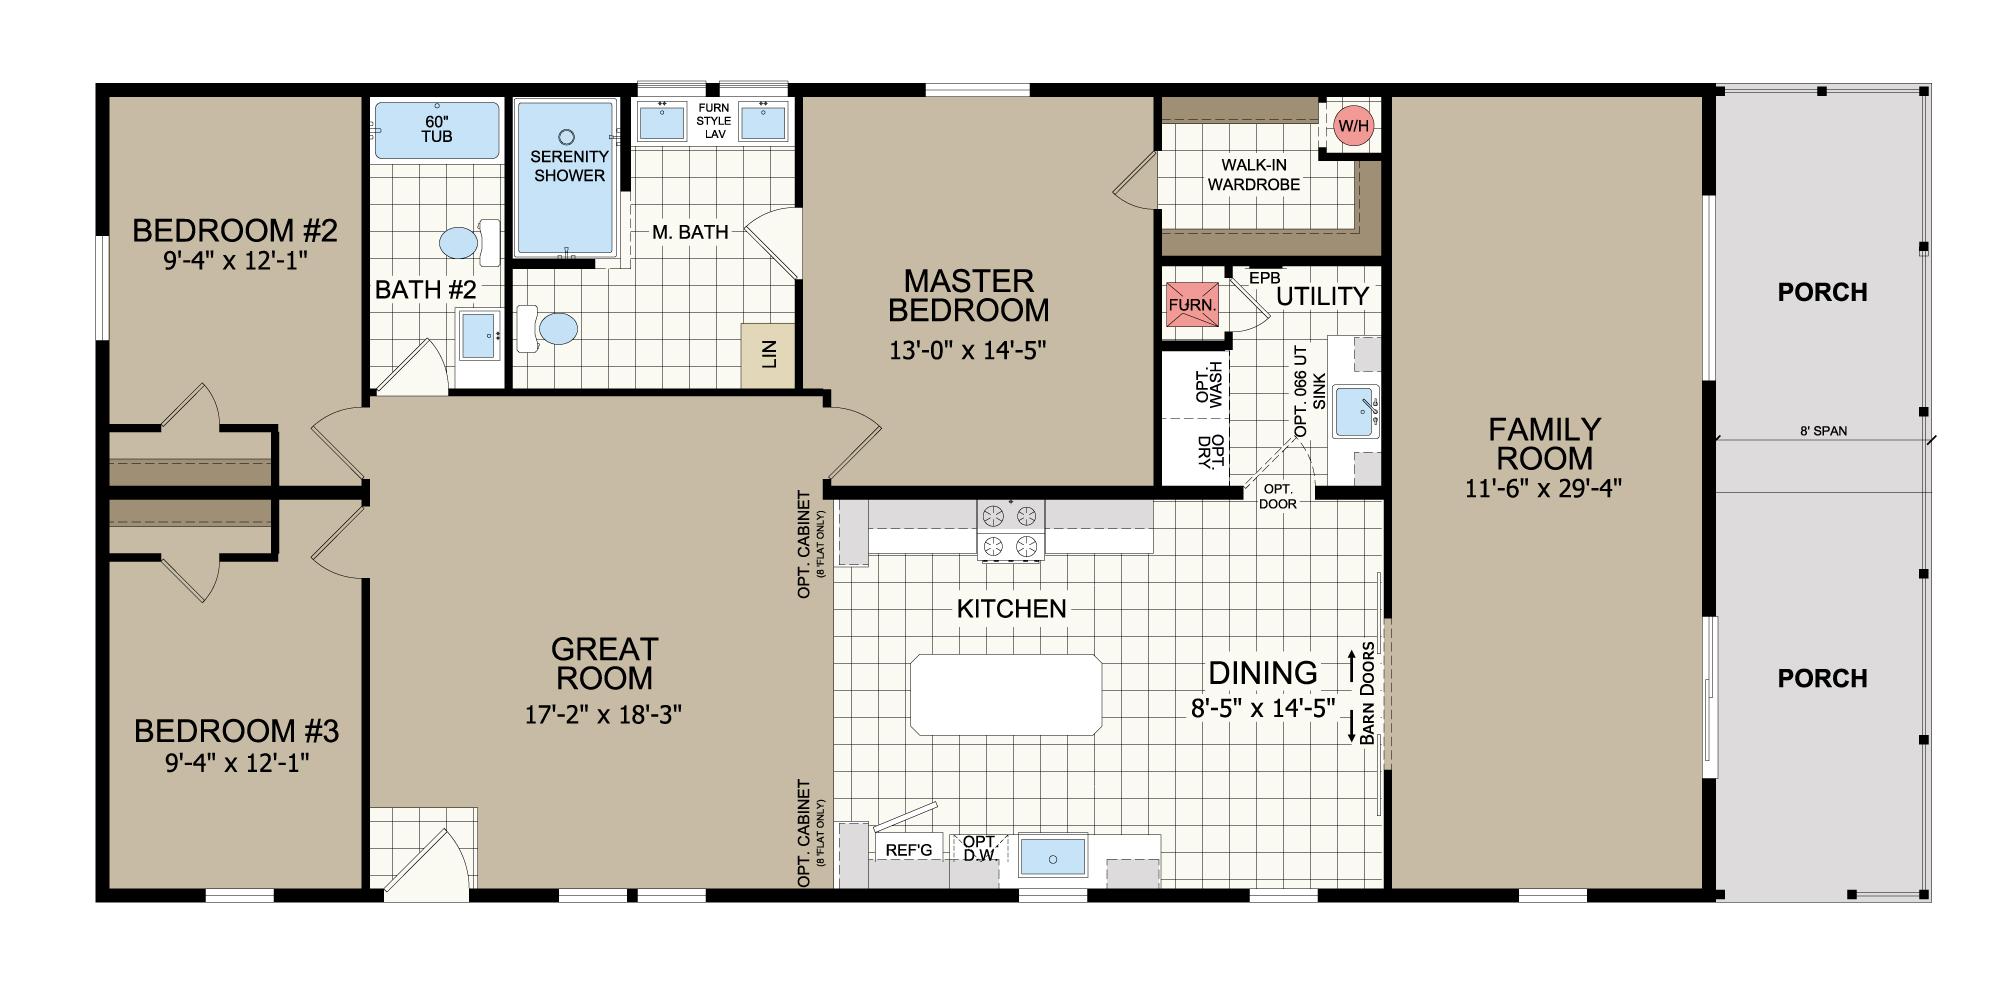 floorplan image for unit 341